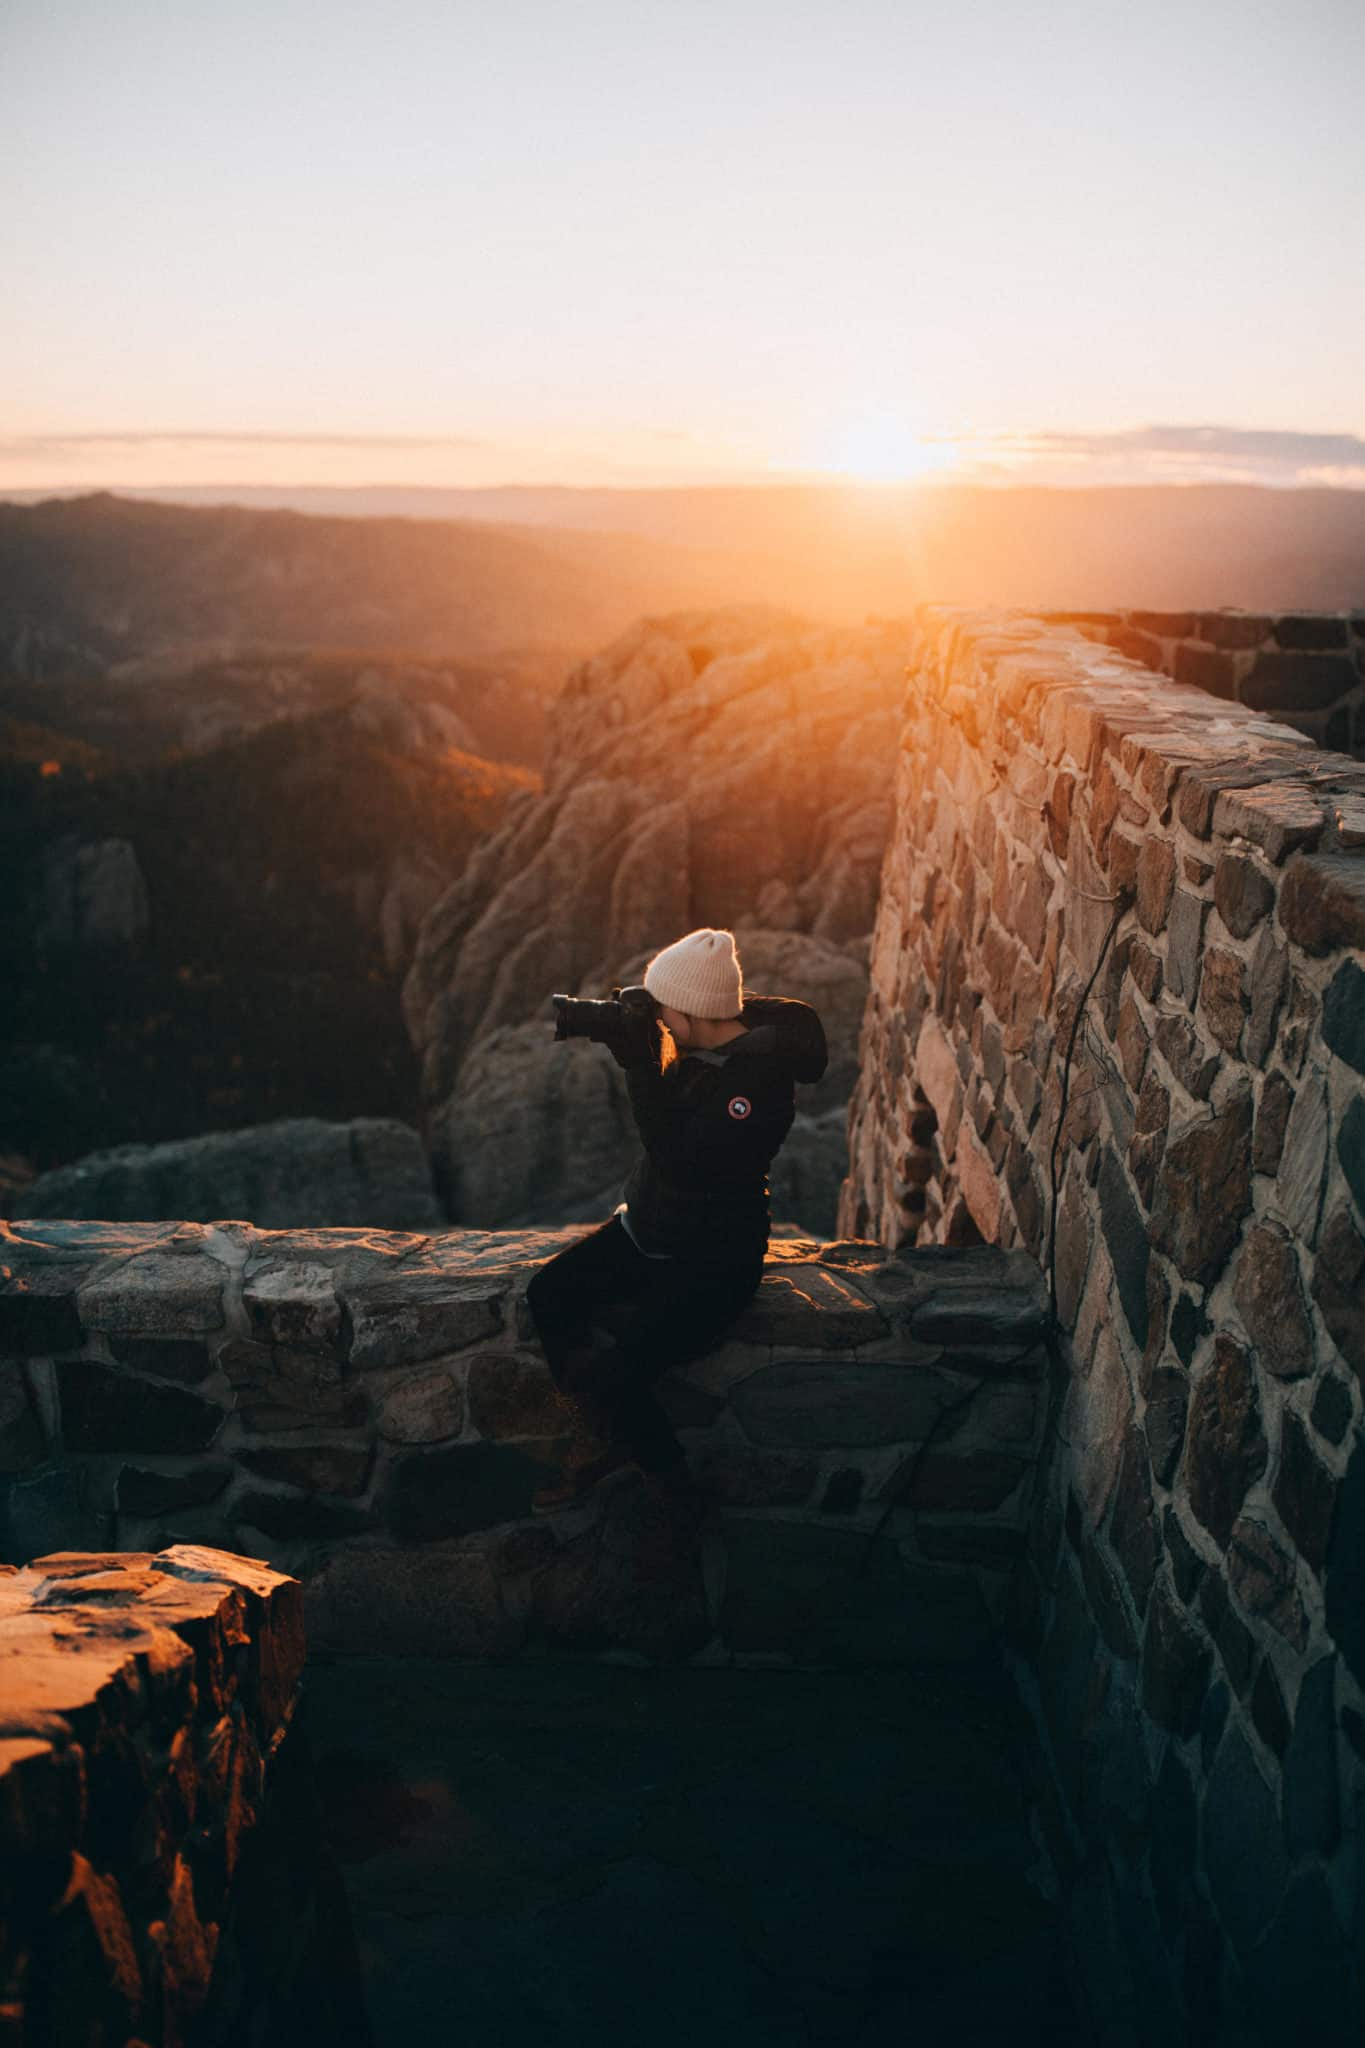 Emily Mandagie taking photos during sunset on Black Elk Peak Trail